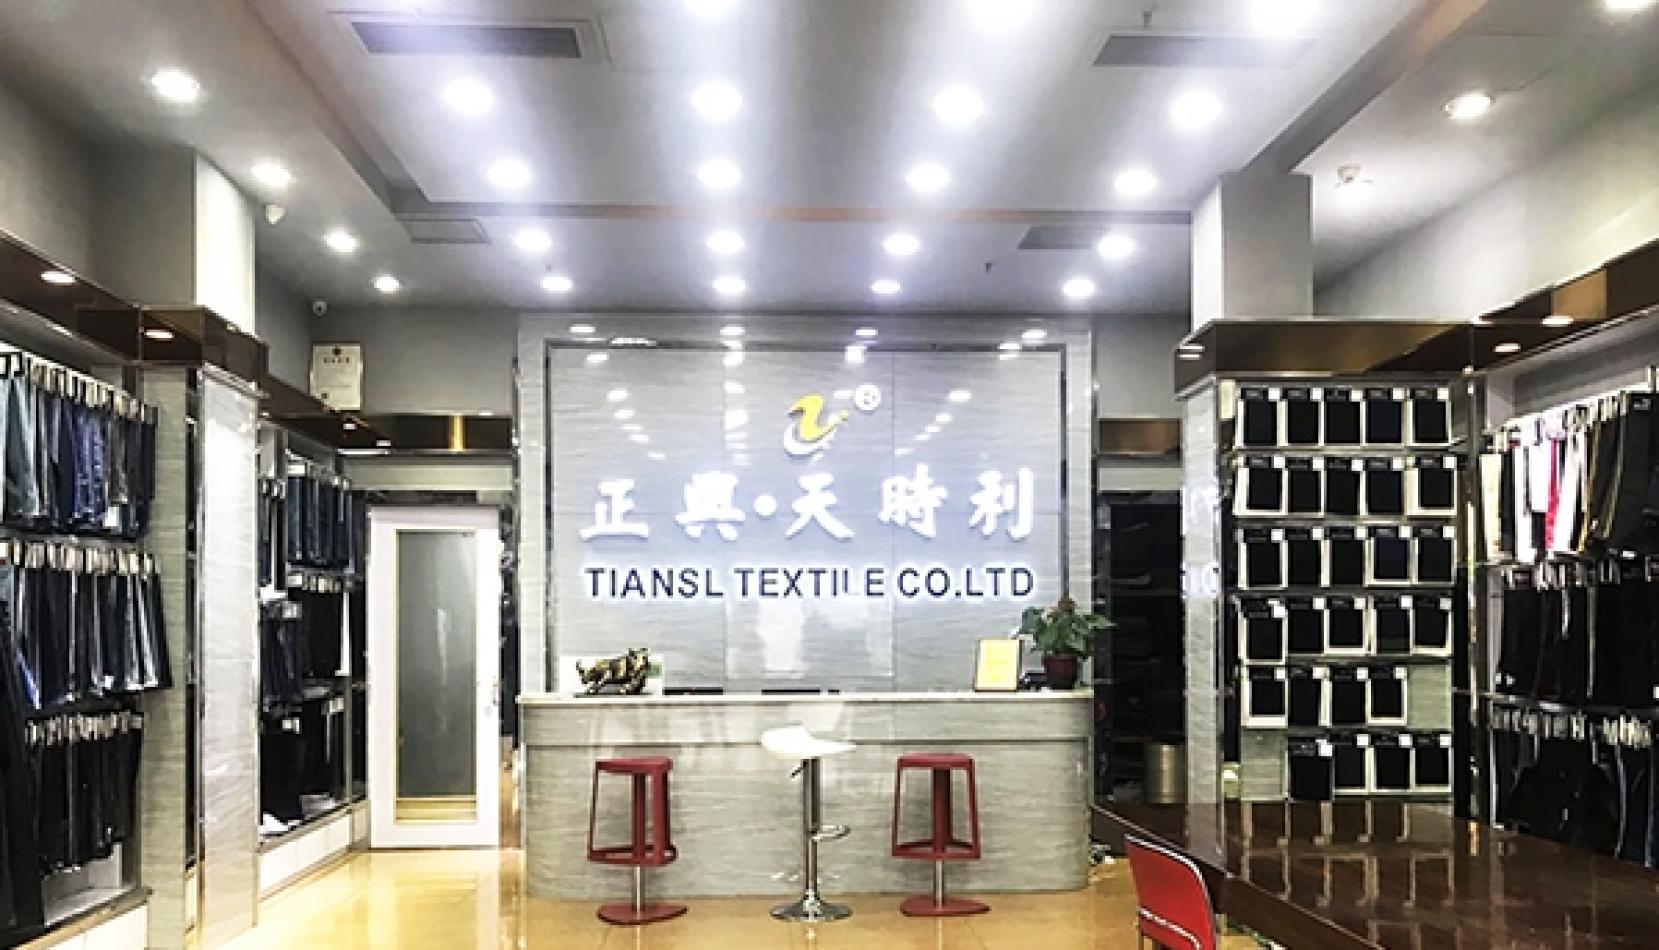 GUANGZHOU TIANSL TEXTILE CO., LTD